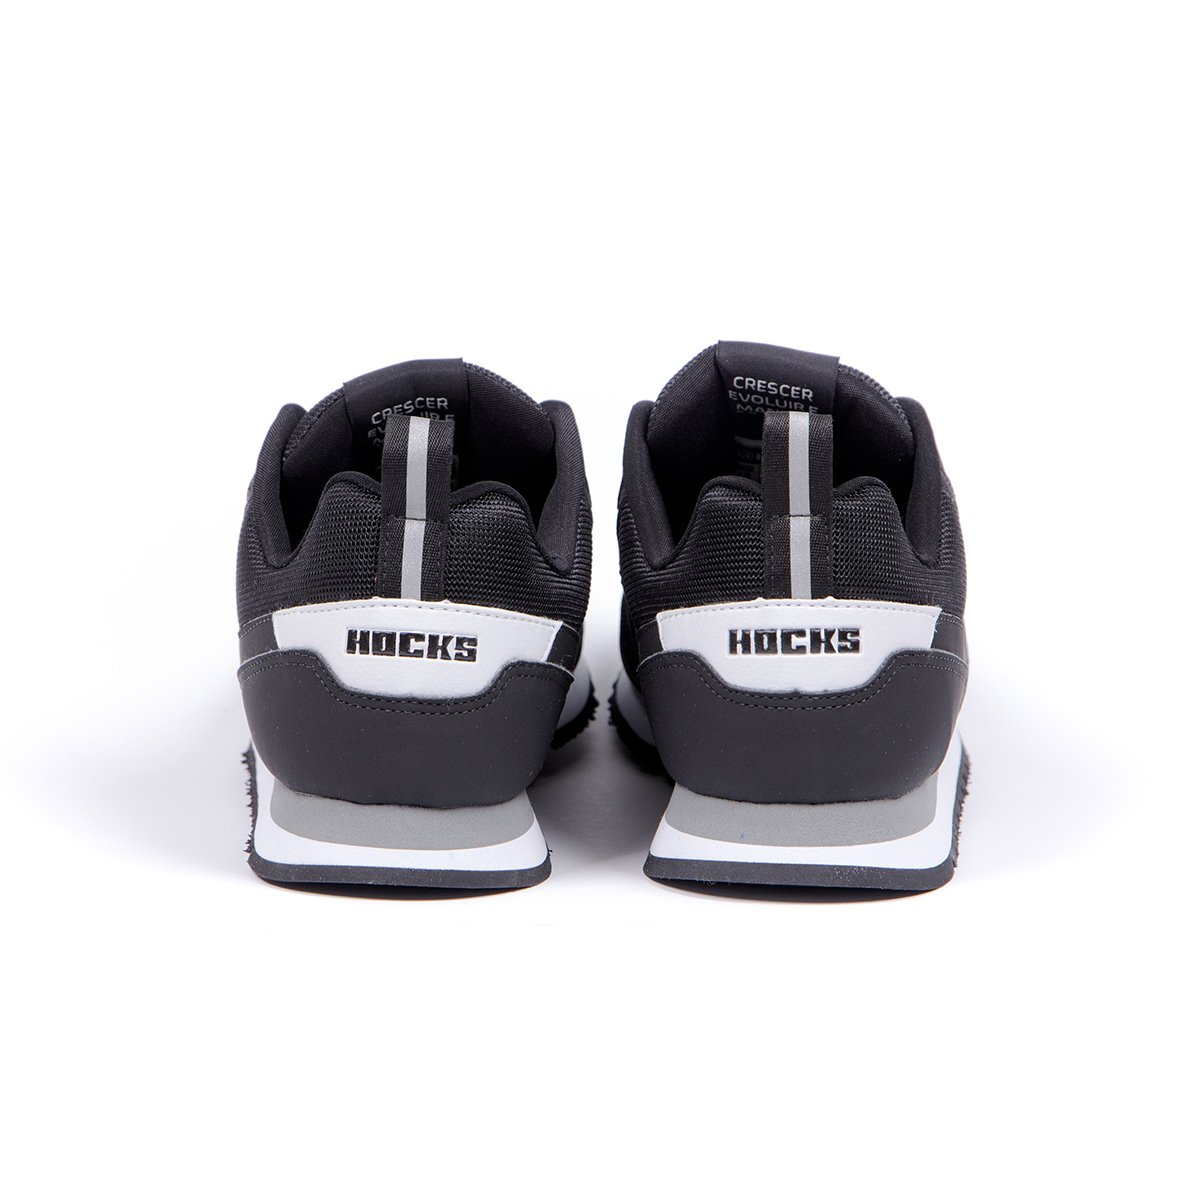 Tênis Hocks Nuv Black White